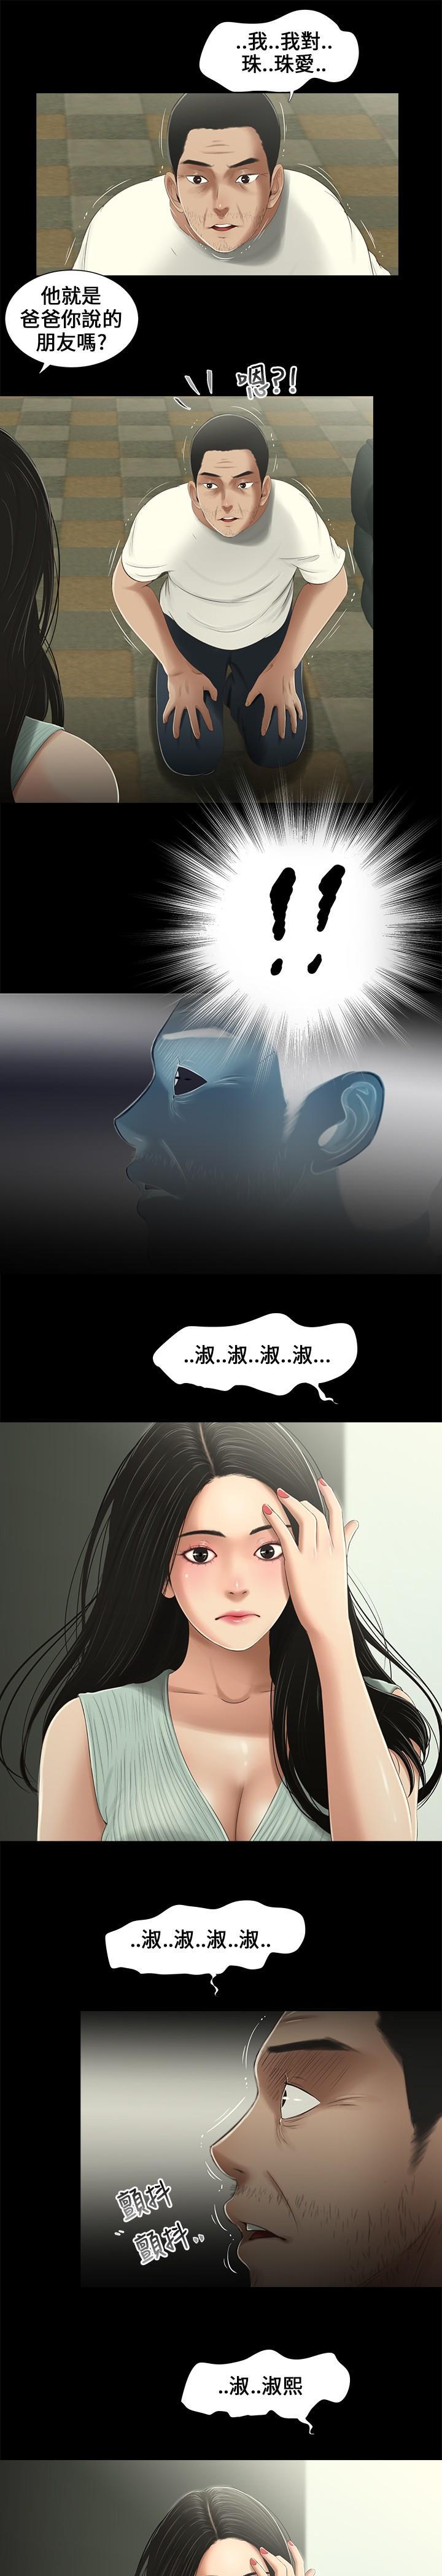 Three sisters 三姐妹Ch.13~19 (Chinese)中文 105